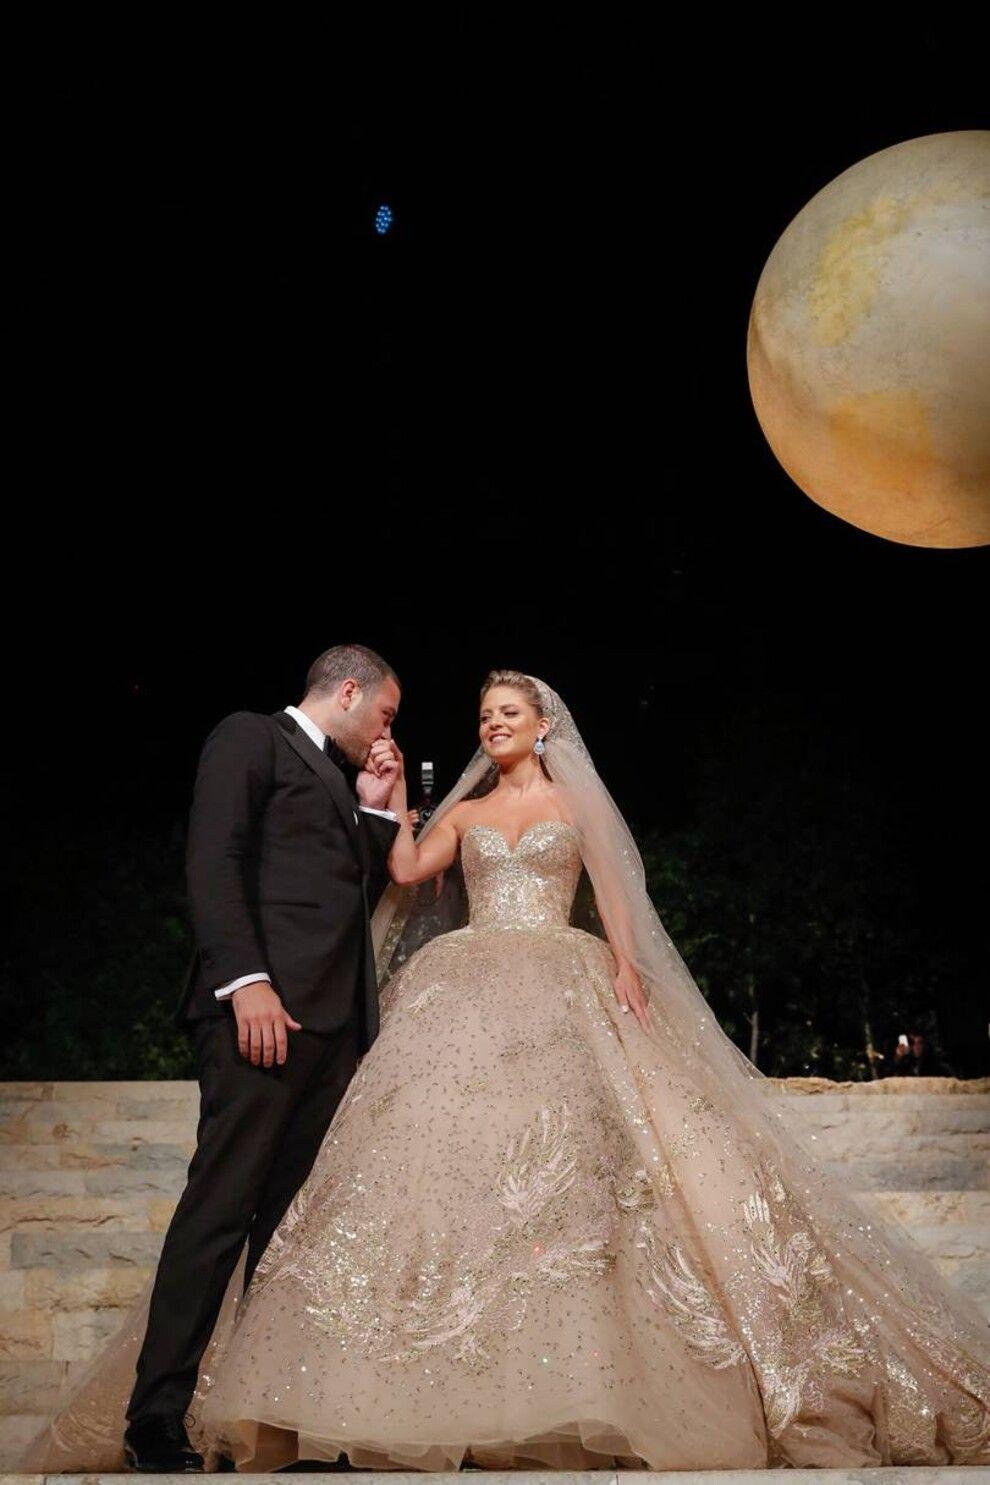 Christina Mourad Married Elie Saab Jr The Son Of Lebanese Fashion Designer Elie Saab Fashion Celebrity Wedding Dress